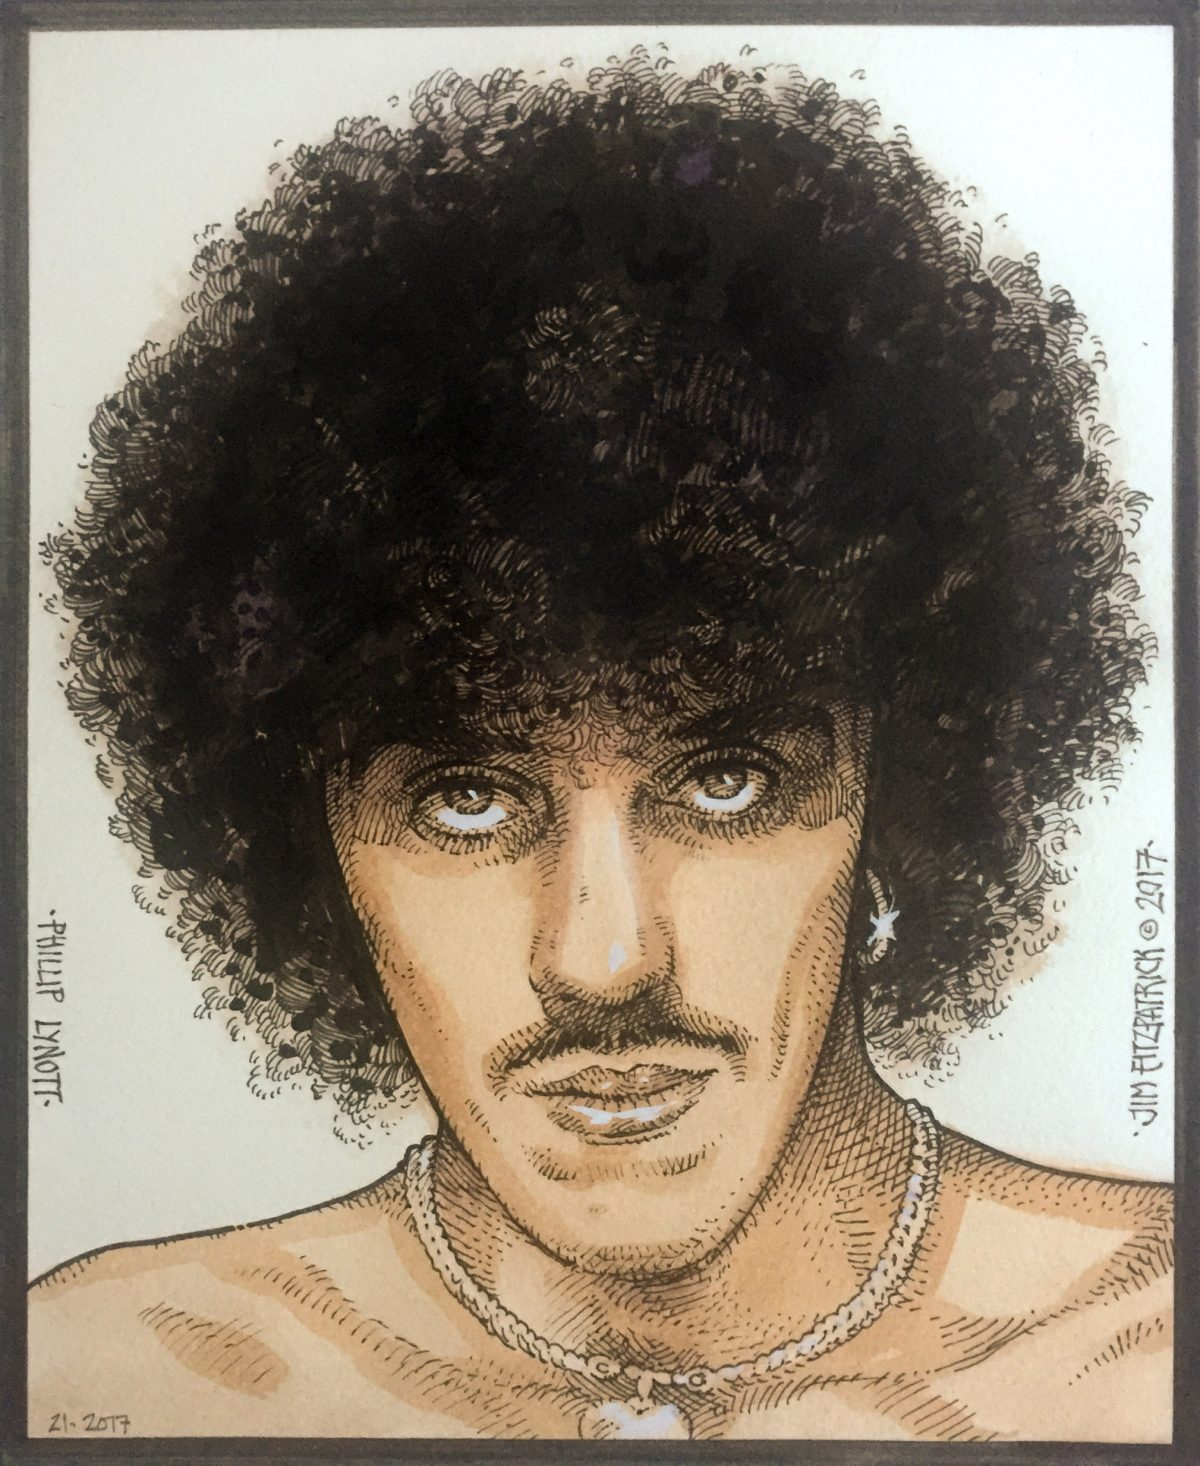 Philip Lynott, Thin Lizzy, Philip Lynott Portrait, Jim FitzPatrick Artist, Art, Watercolor portrait, Thin Lizzy Frontman